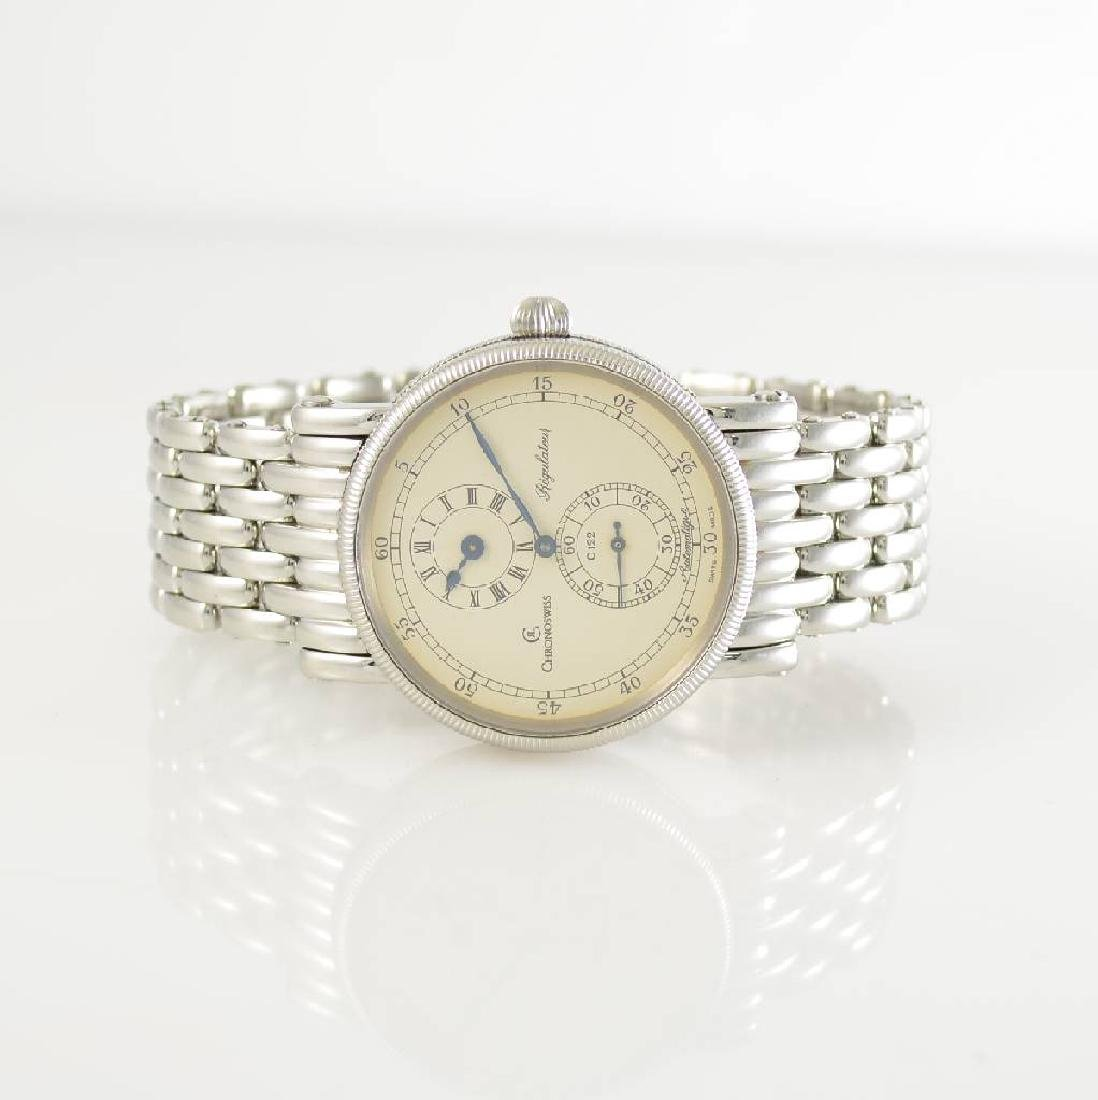 CHRONOSWISS self winding gents wristwatch Regulateur